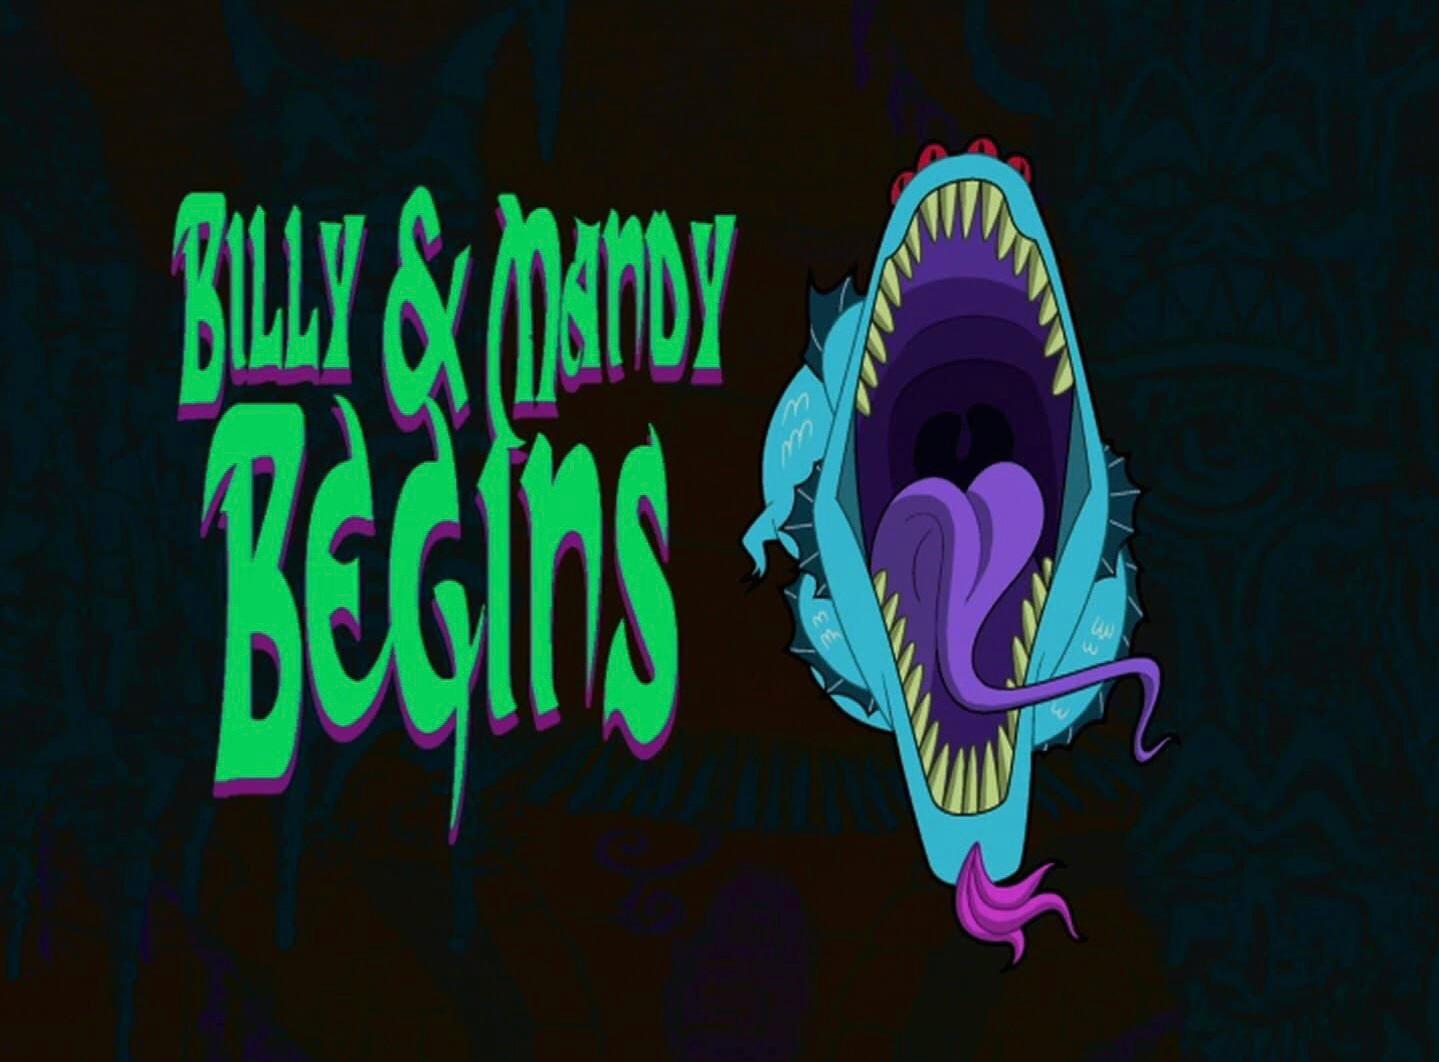 File:Billy & Mandy Begins.png